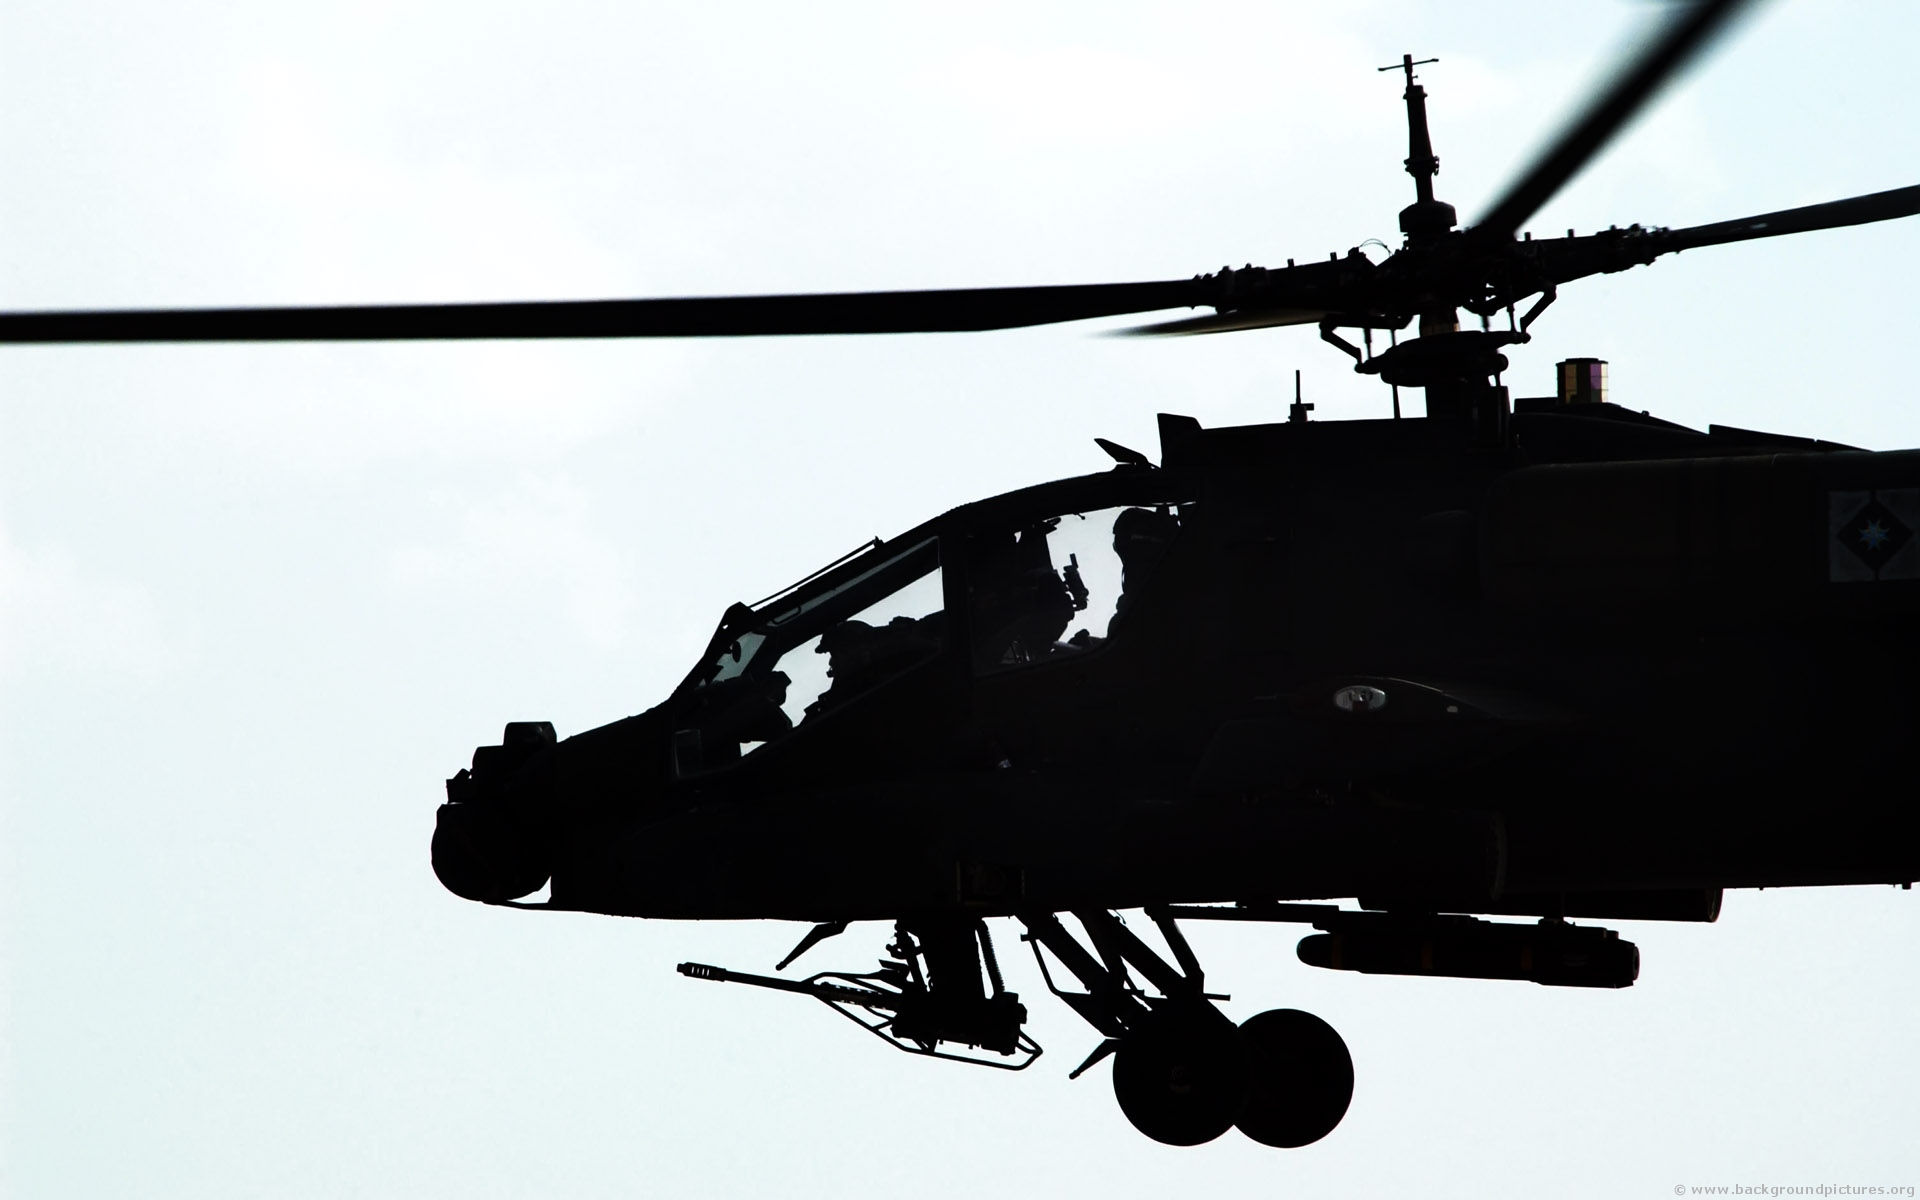 AH 64 Apache - 1920x1200